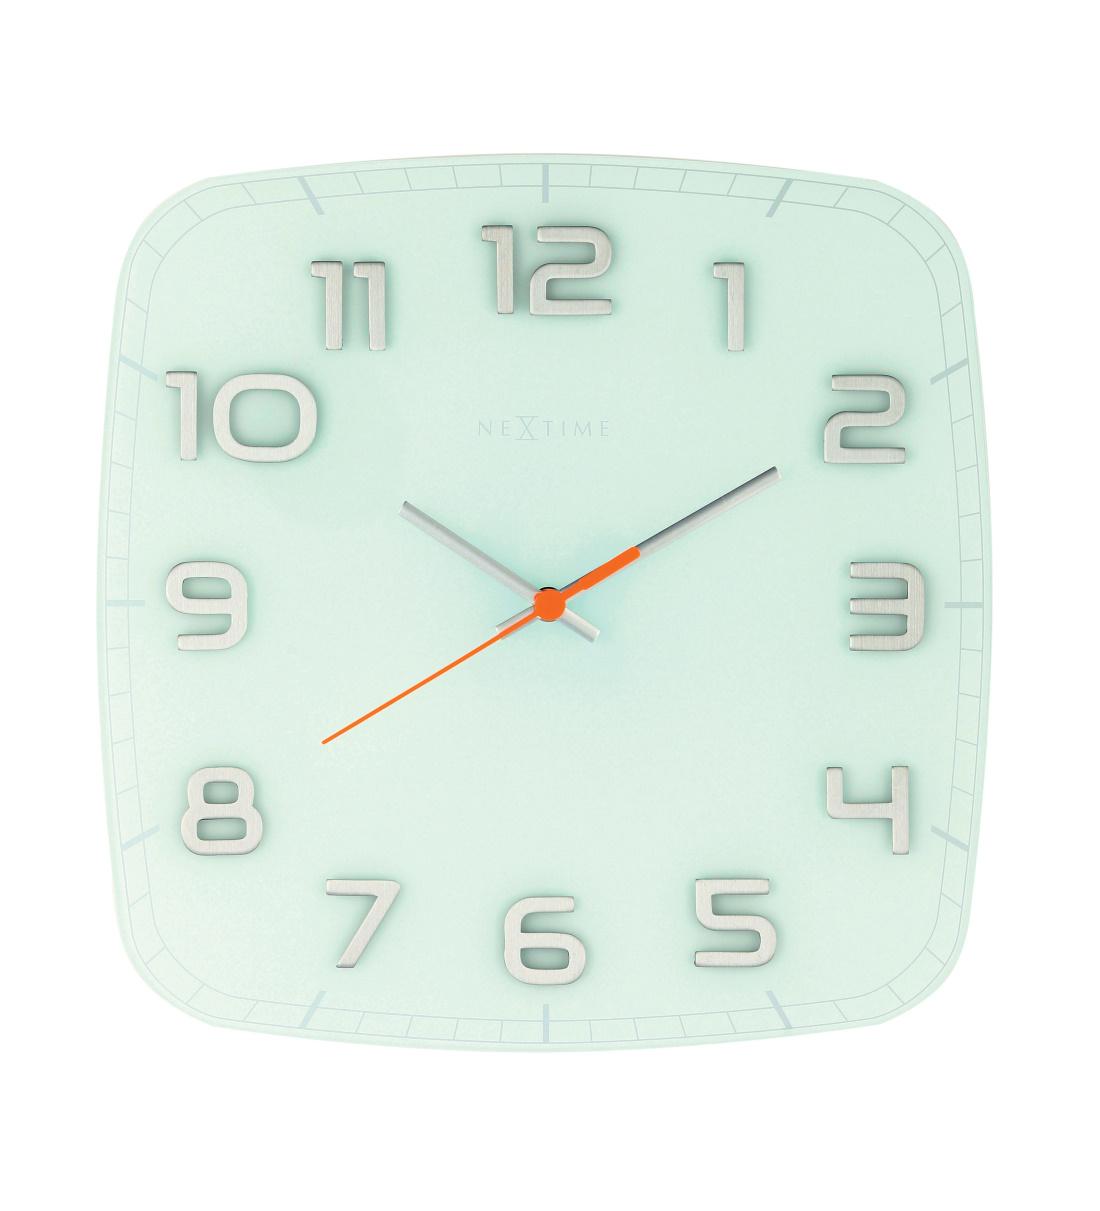 NeXtime Wanduhr CLASSY SQUARE 30x30 cm lautlos Wohnzimmer Glas Büro ...